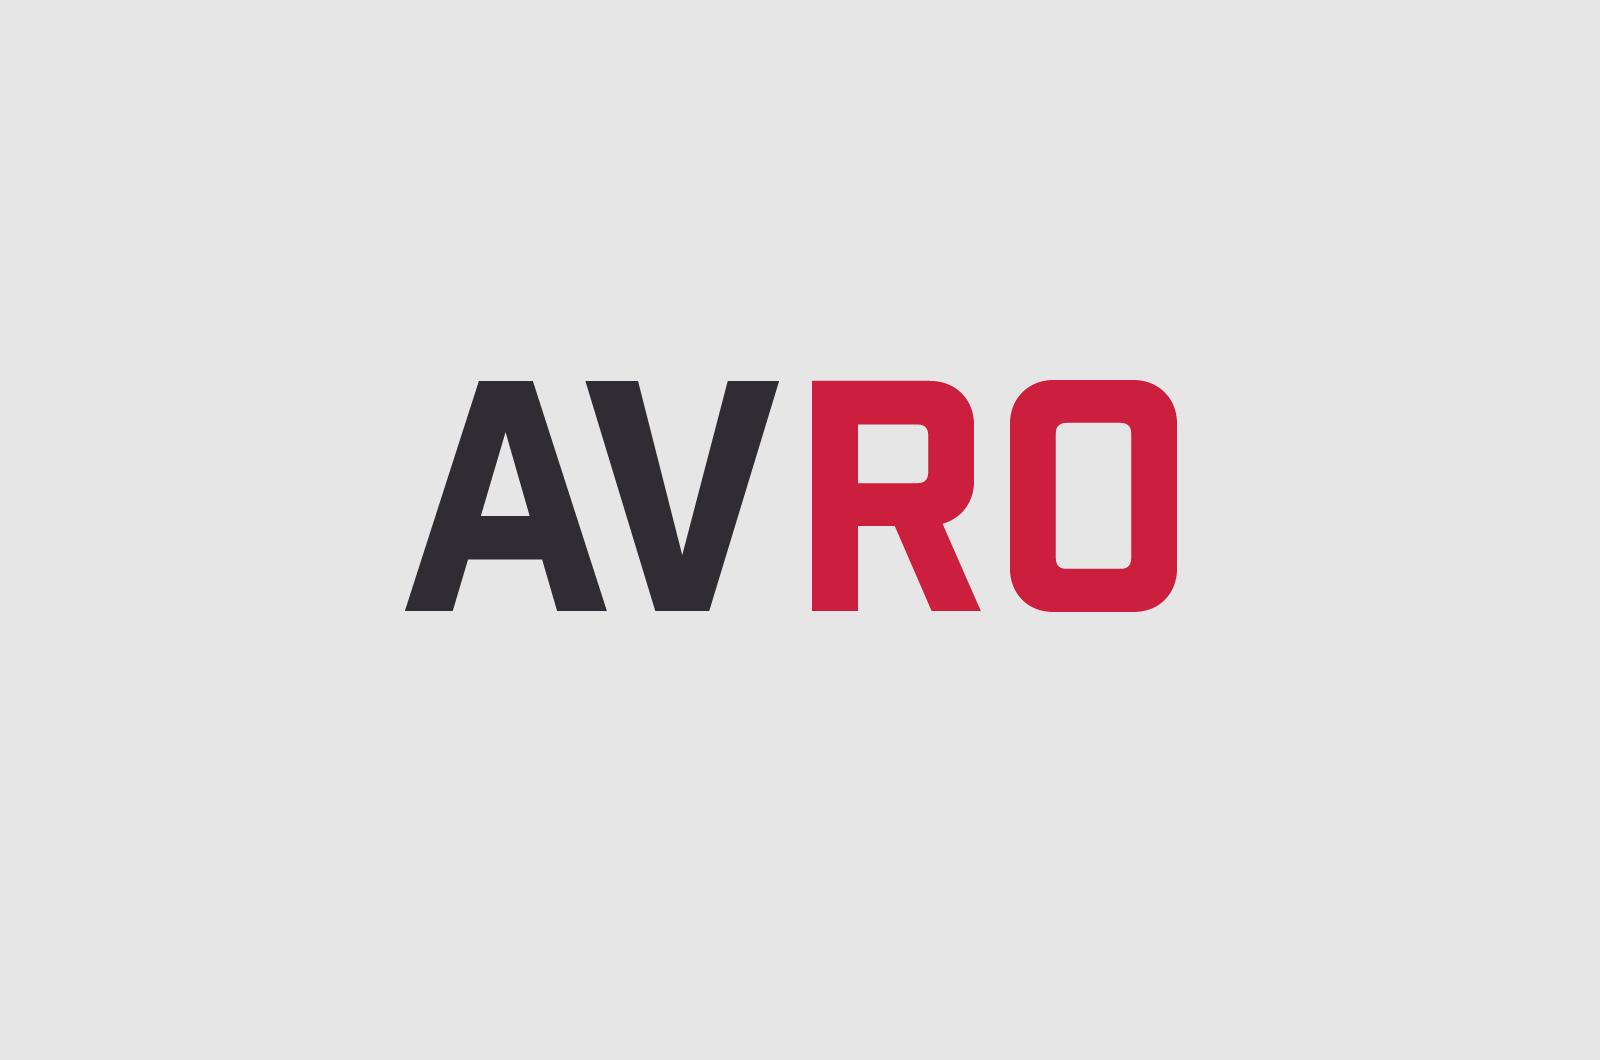 AVRO Brand 01